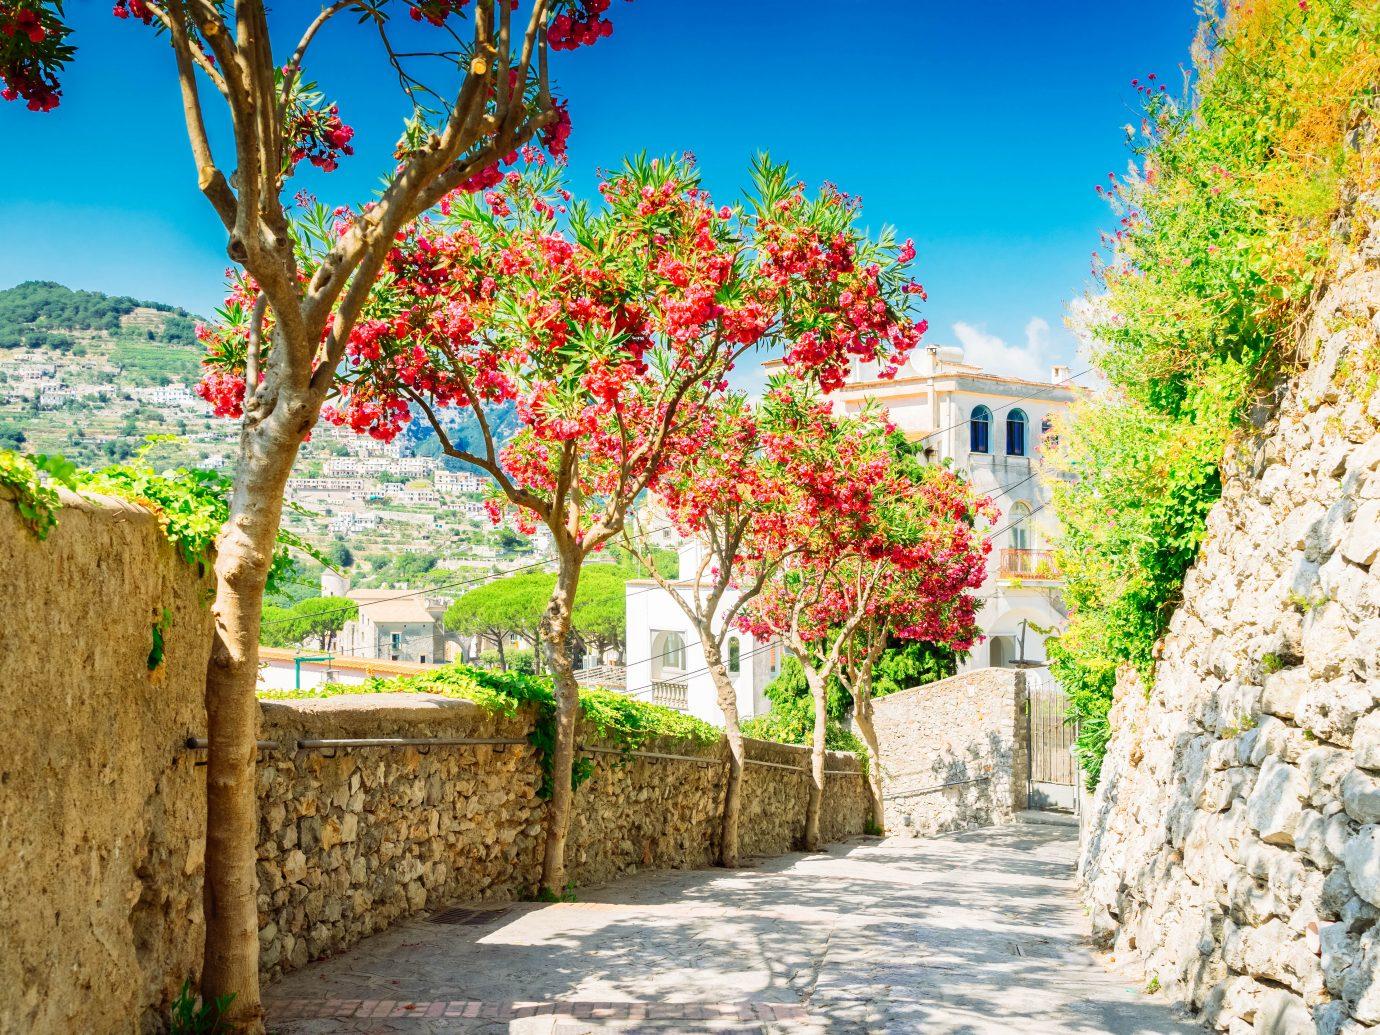 Street in Ravello village, Amalfi coast of Italy, toned image